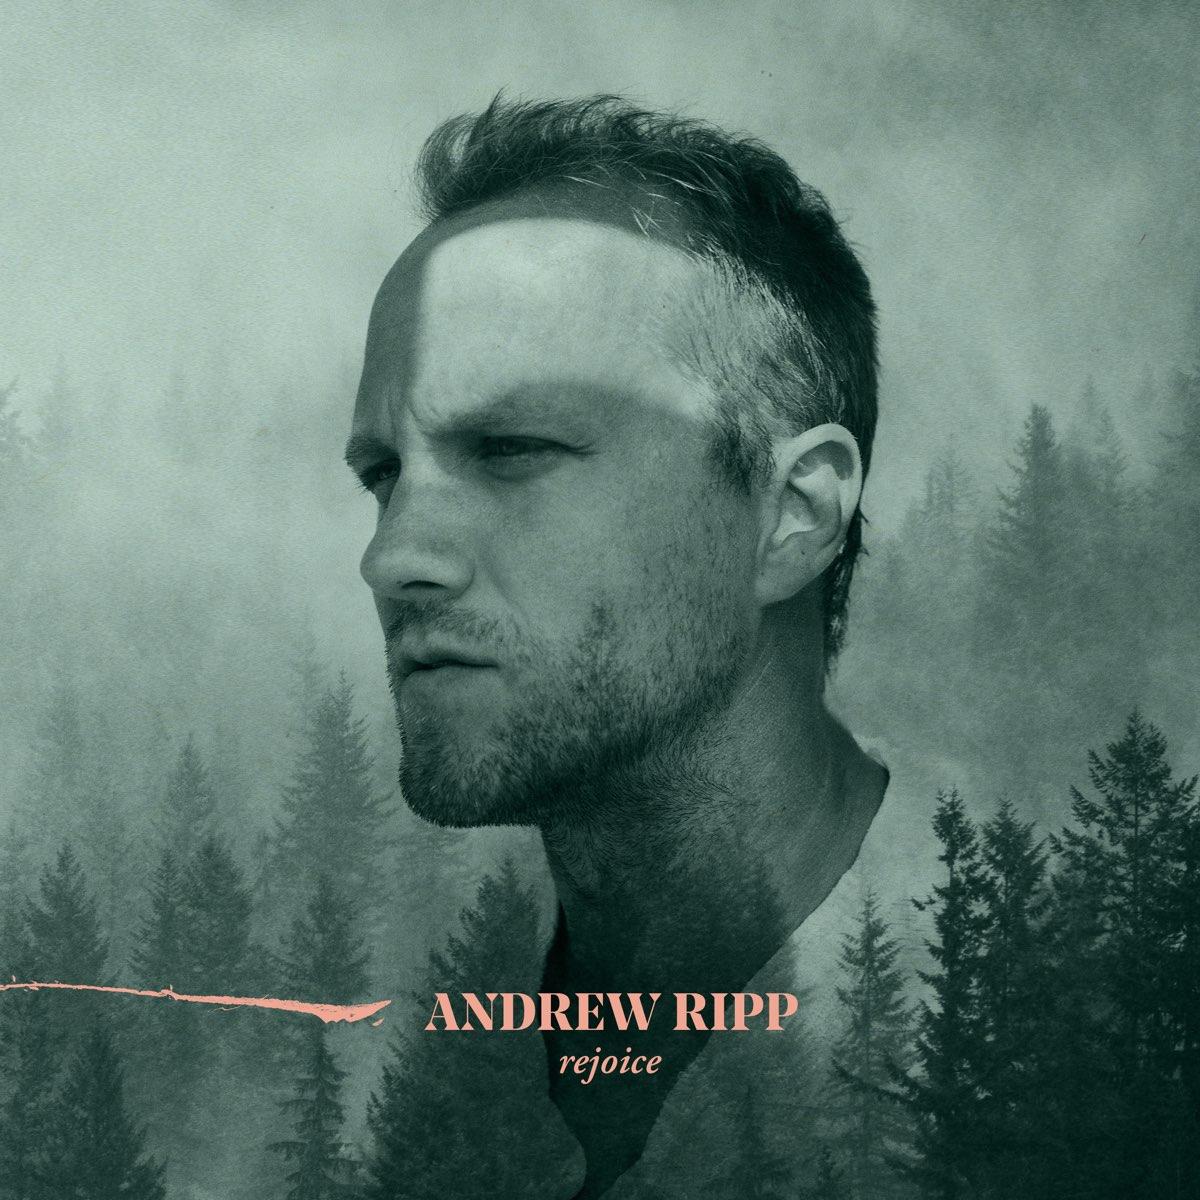 Andrew Ripp - Rejoice